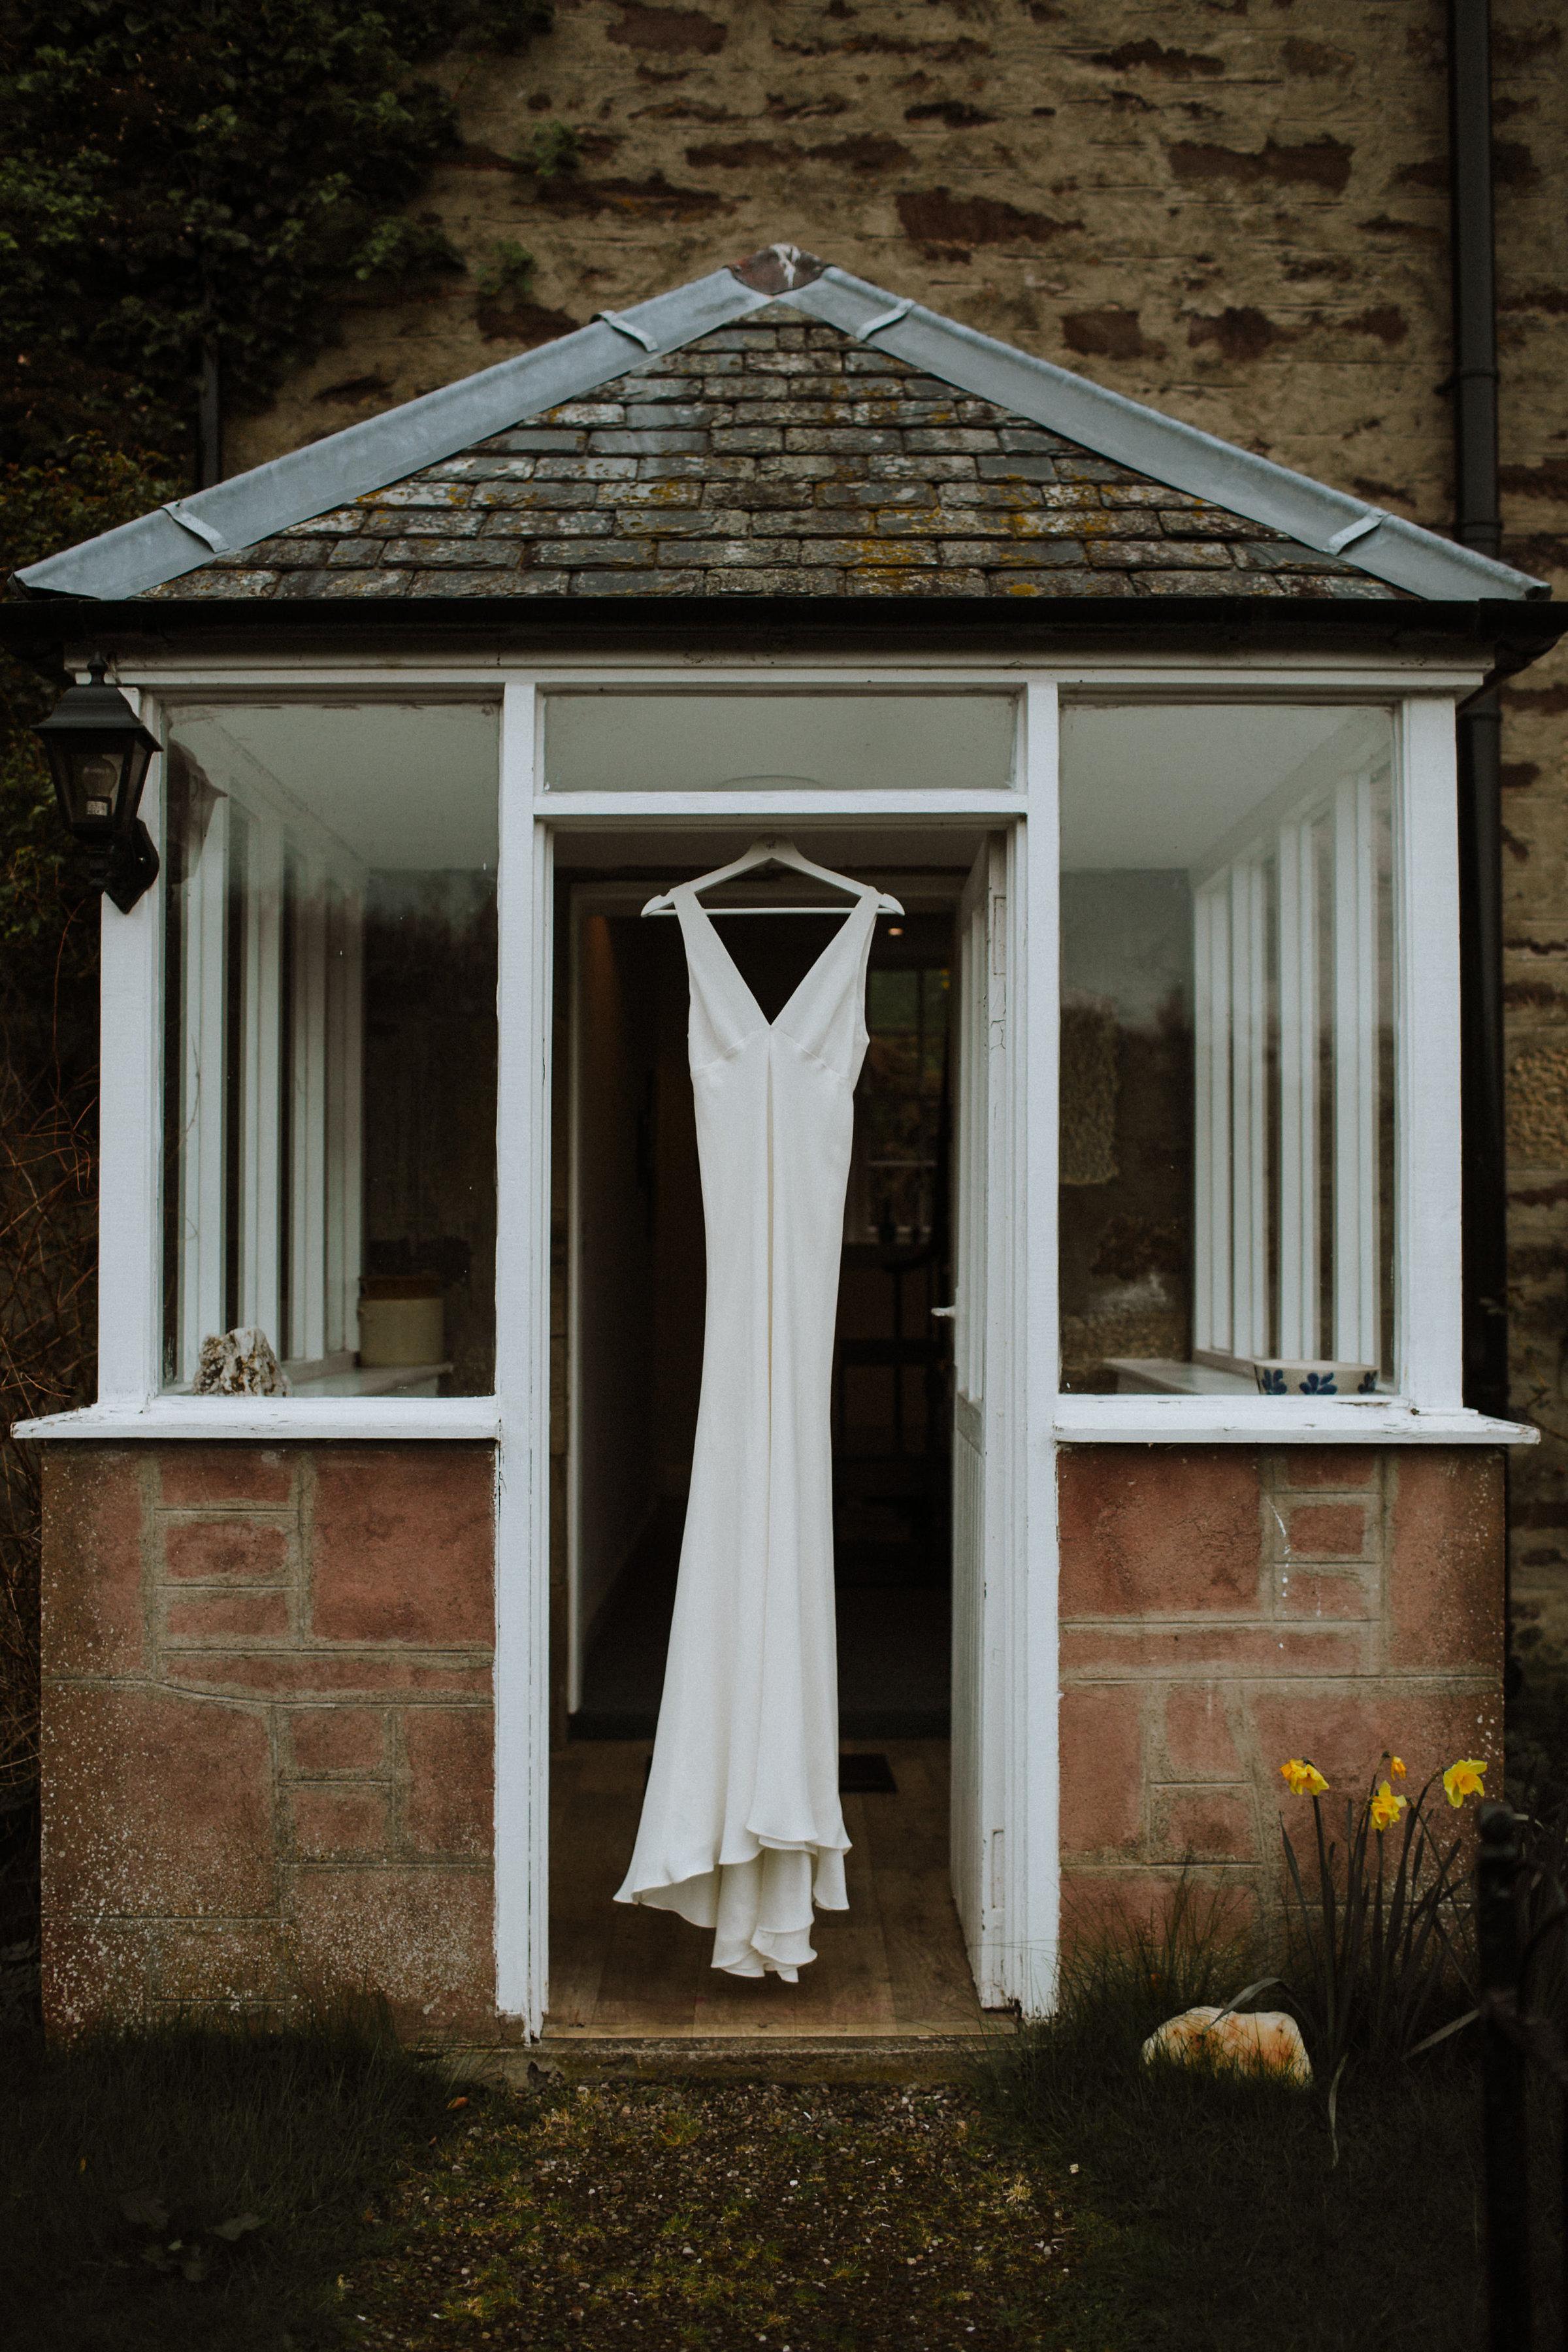 Katt-Scotland-Comrie-Crieff-Bias-Crepe-Wedding-Gown-Lace-Bridal-Biker-Jacket-Bespoke-Susanna-Greening-Derbyshire-2